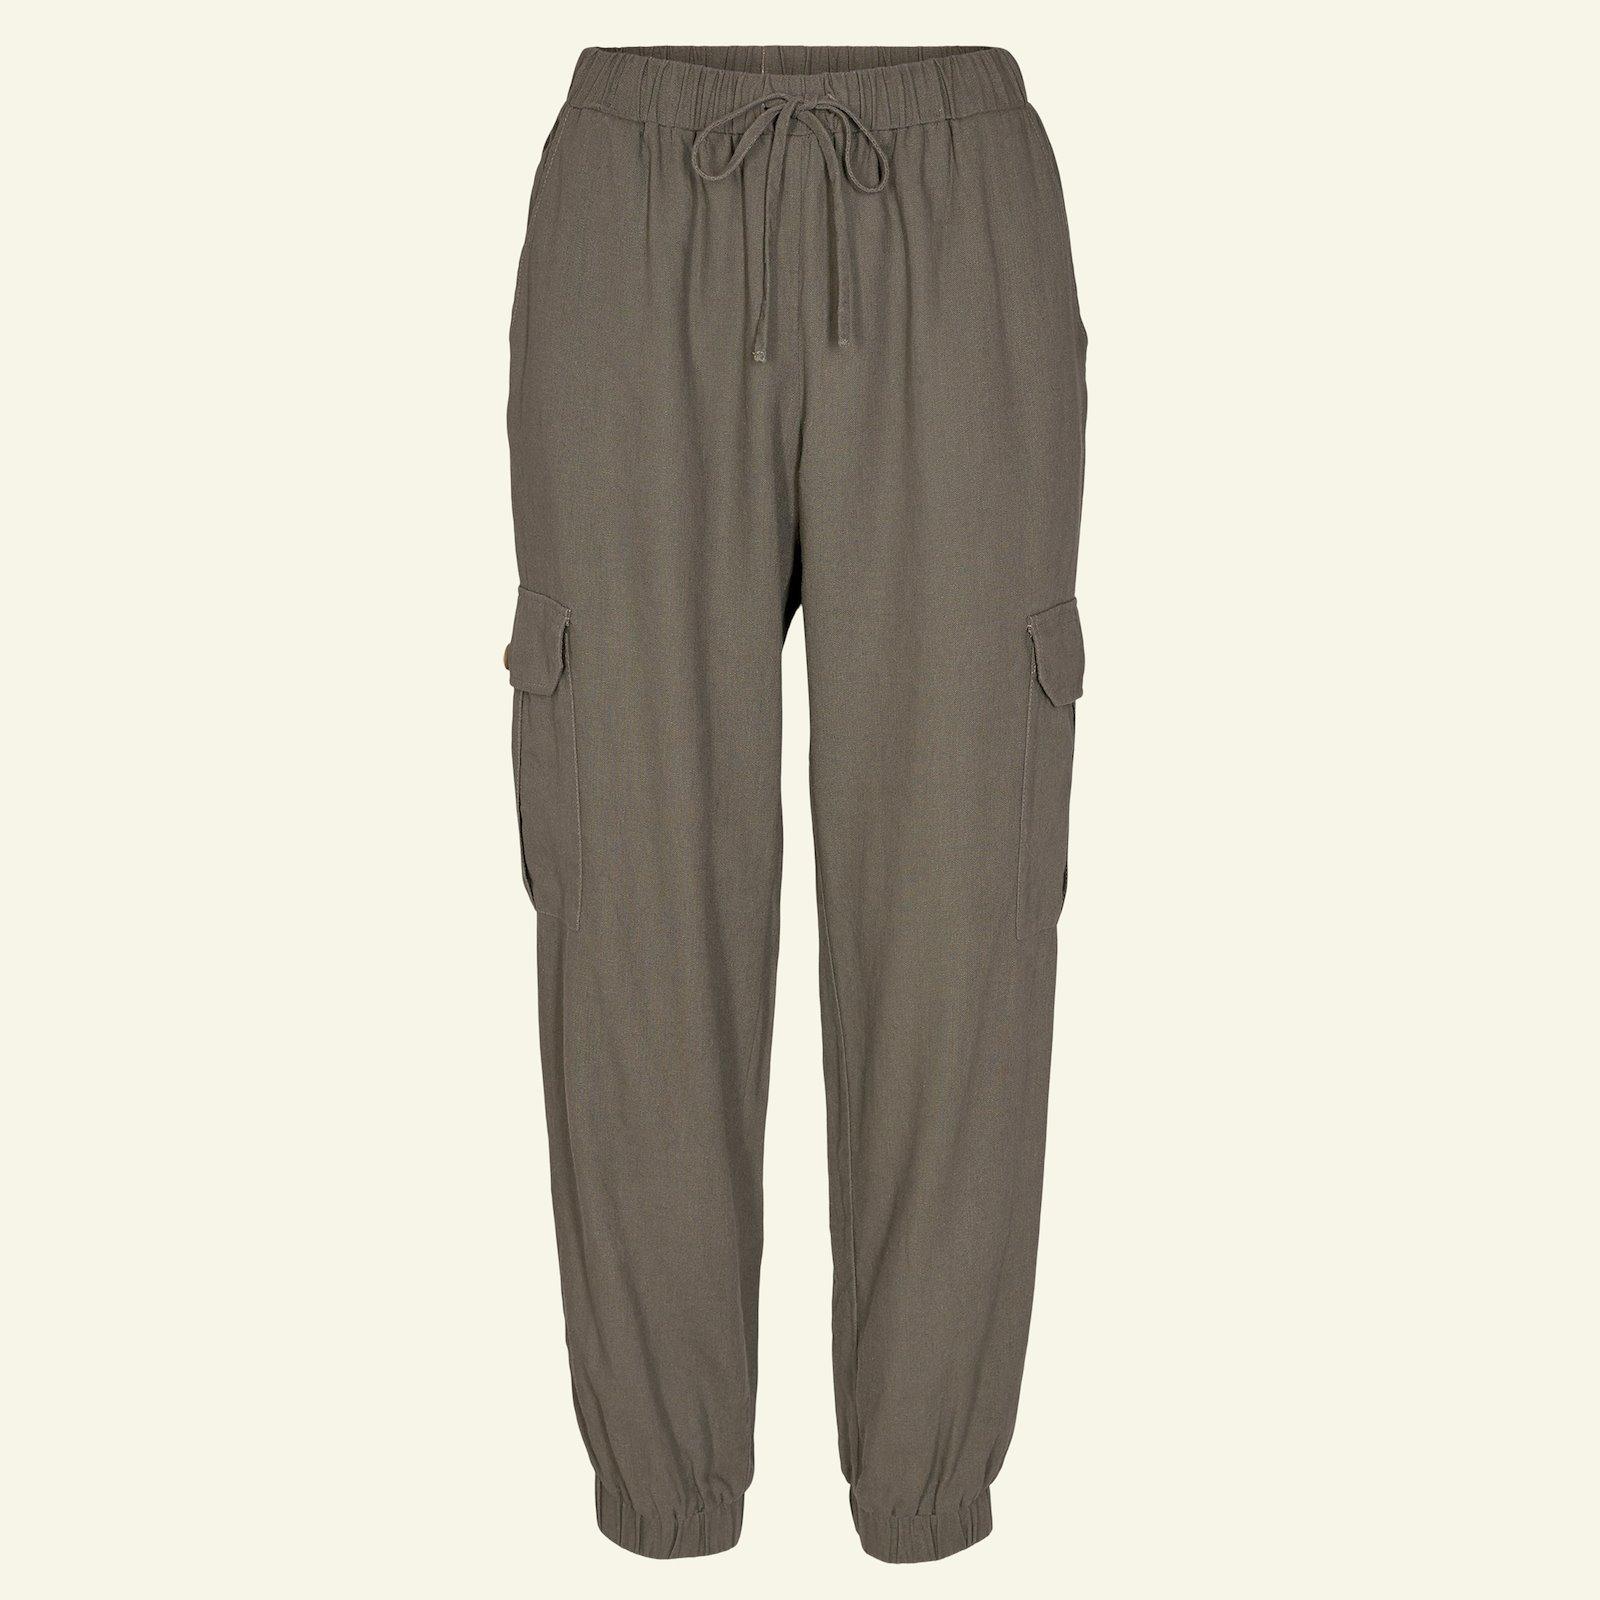 Cargo trousers, 34/6 p20054_510961_sskit